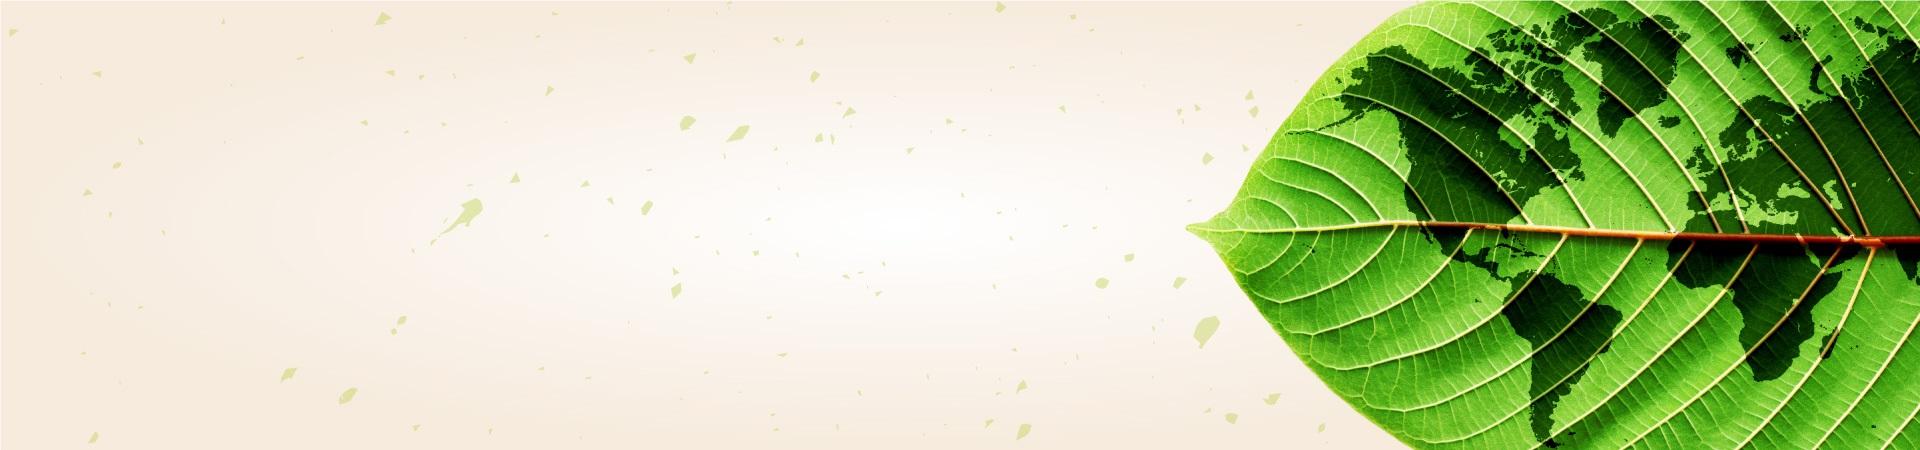 Banner Topo - Semana do Meio Ambiente